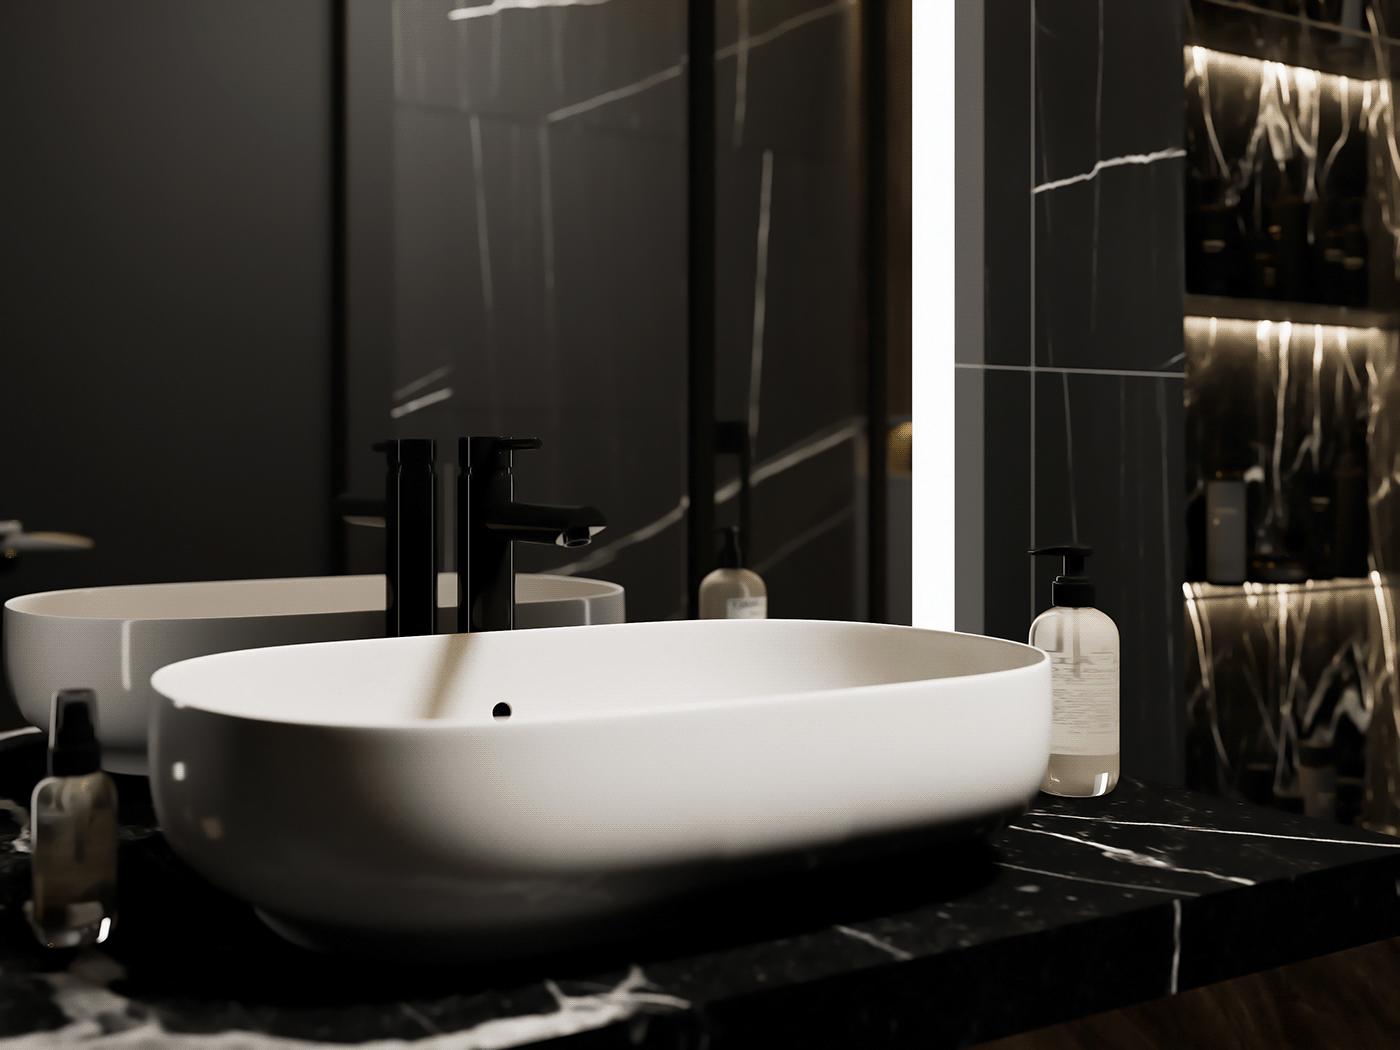 Image may contain: indoor, bathtub and plumbing fixture